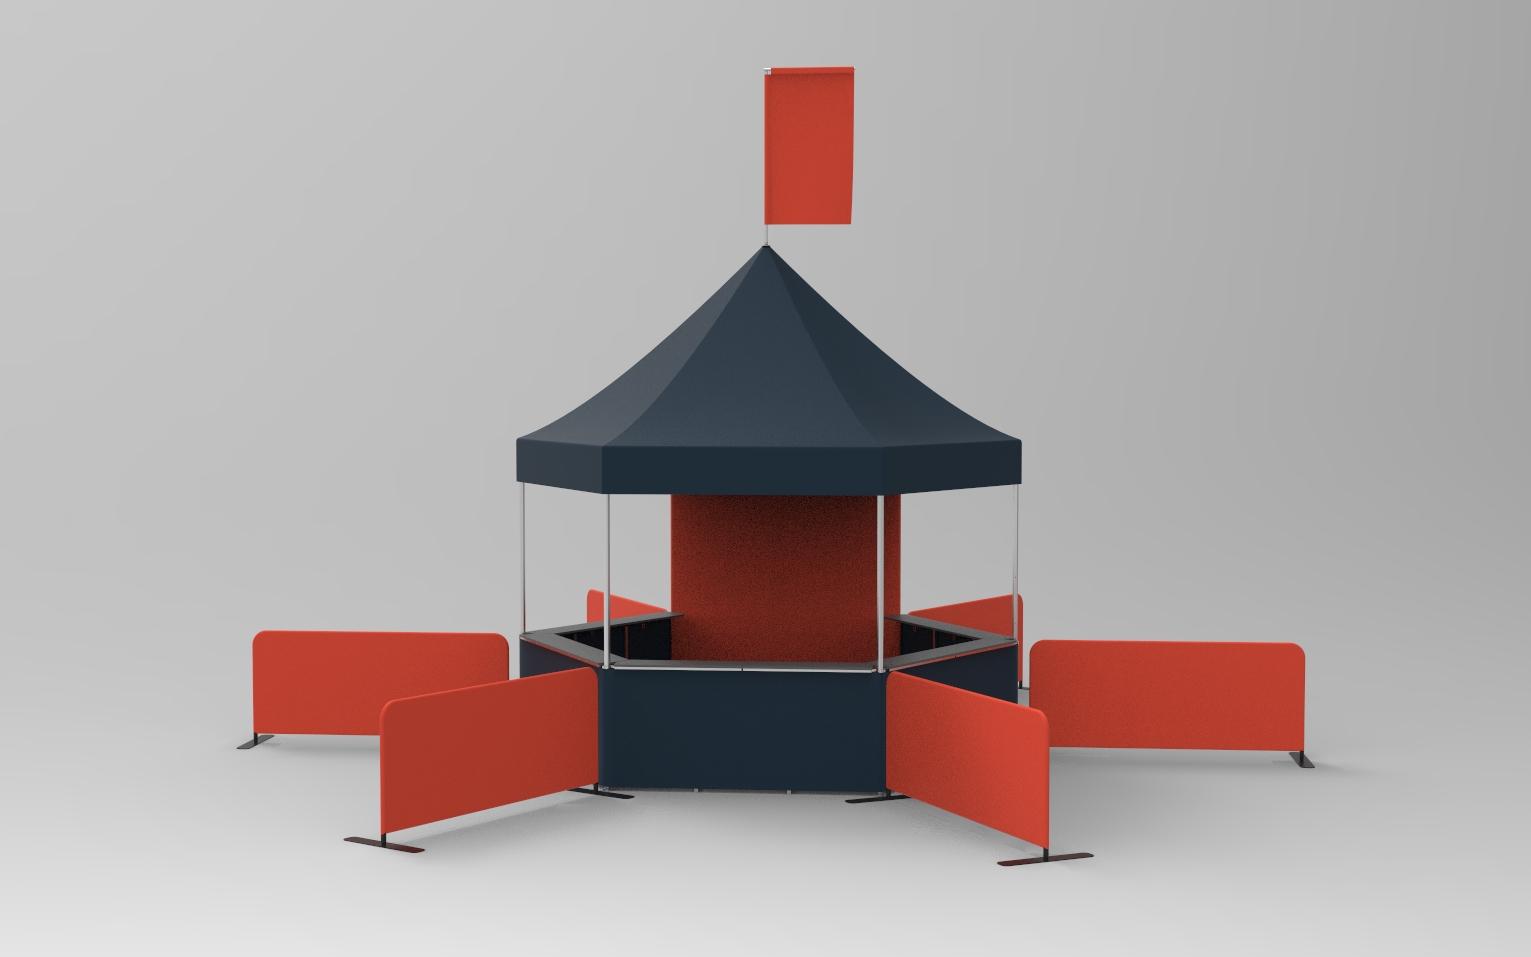 cube style custom canopy tent